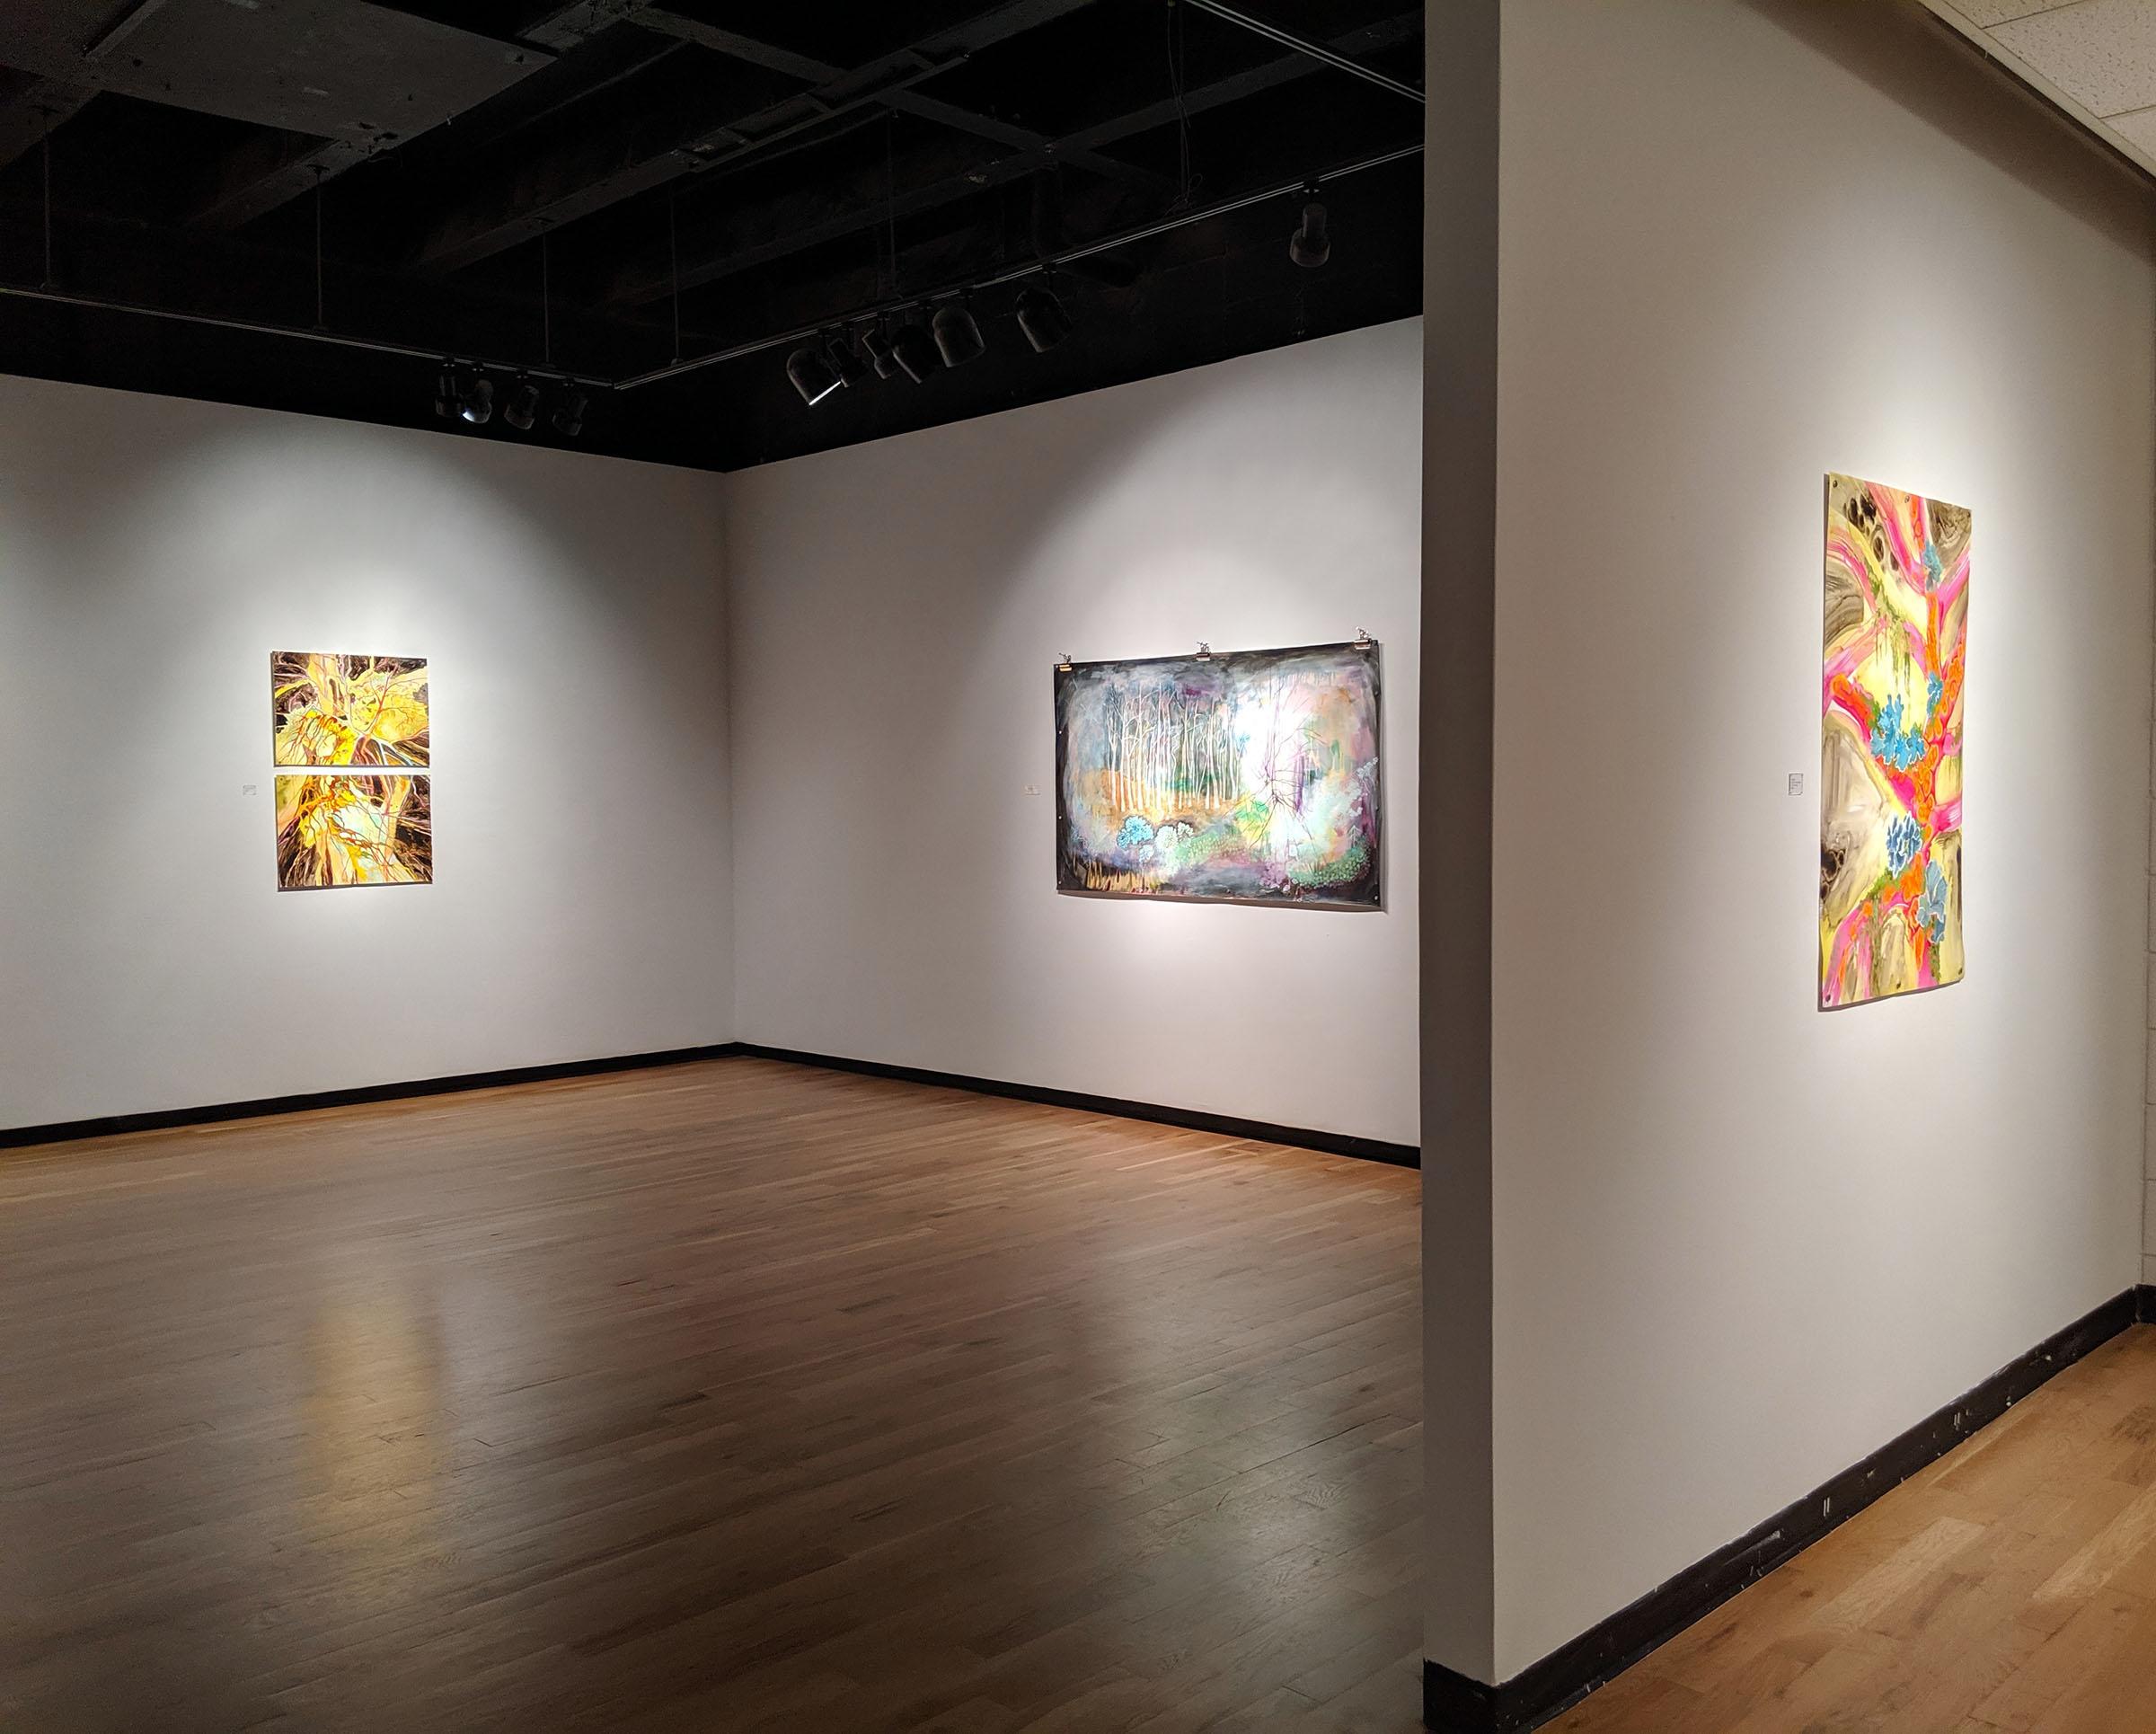 Helen E  Copeland GalleryGallery at the School of Art, Montana State